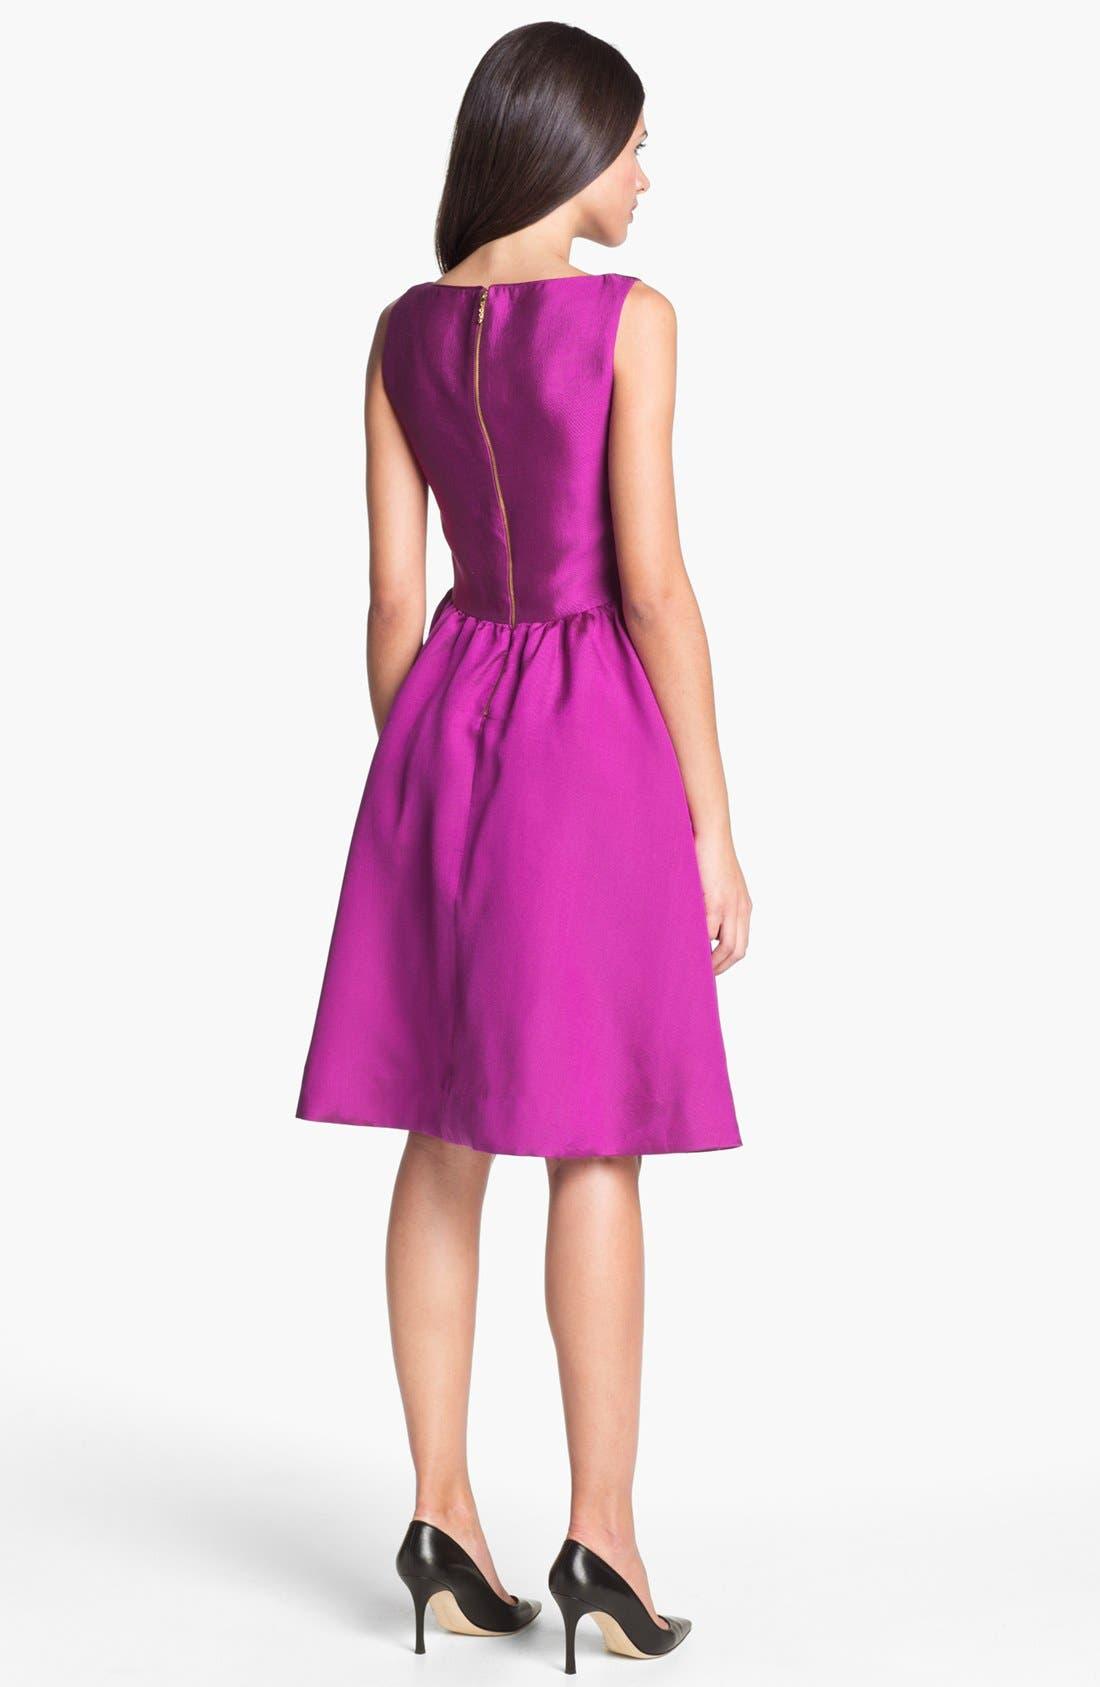 KATE SPADE NEW YORK, 'landry' silk blend fit & flare dress, Alternate thumbnail 3, color, 500